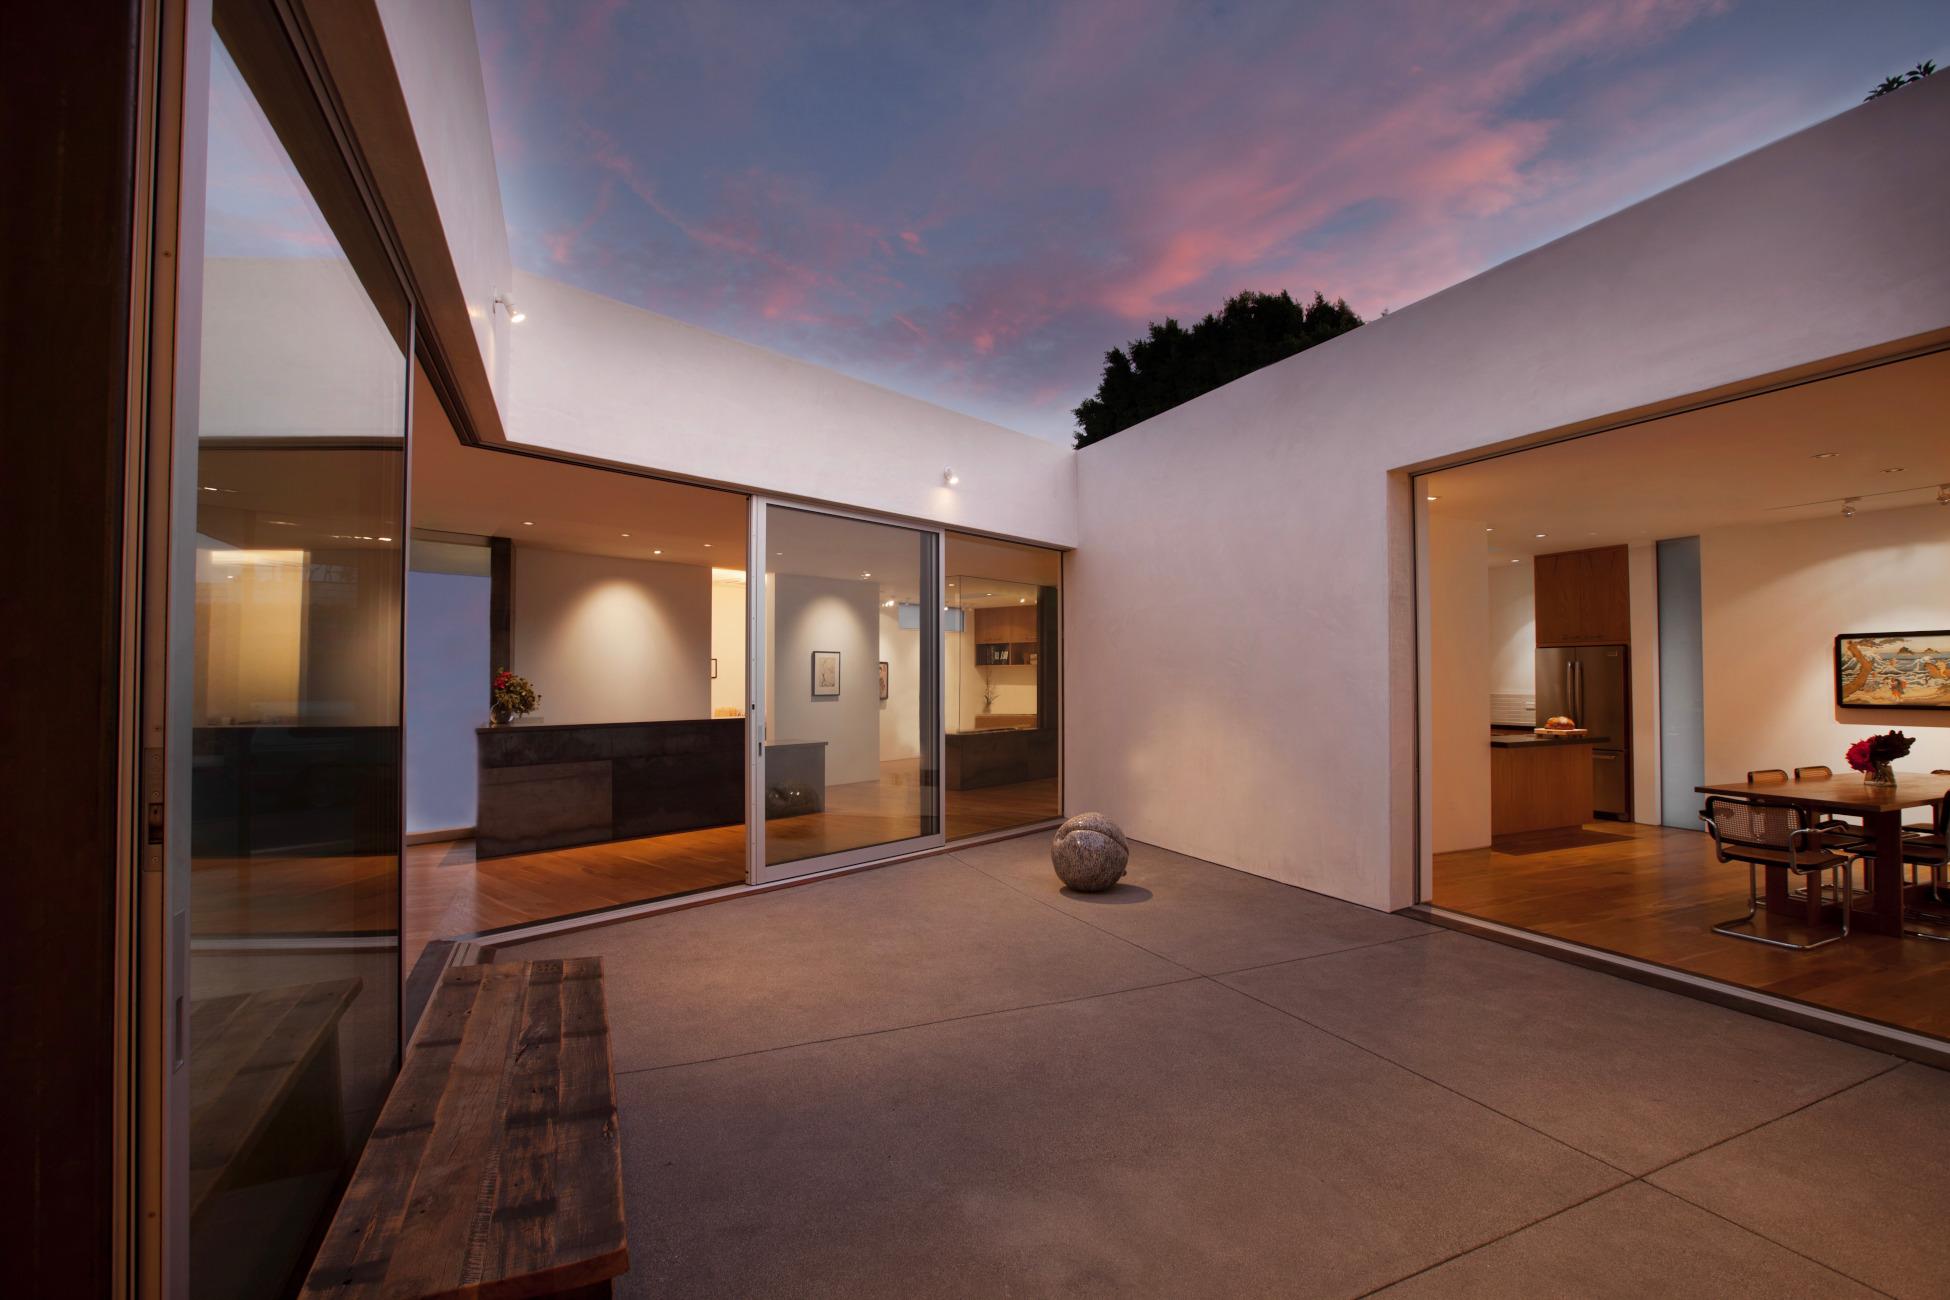 Freeman Gallery